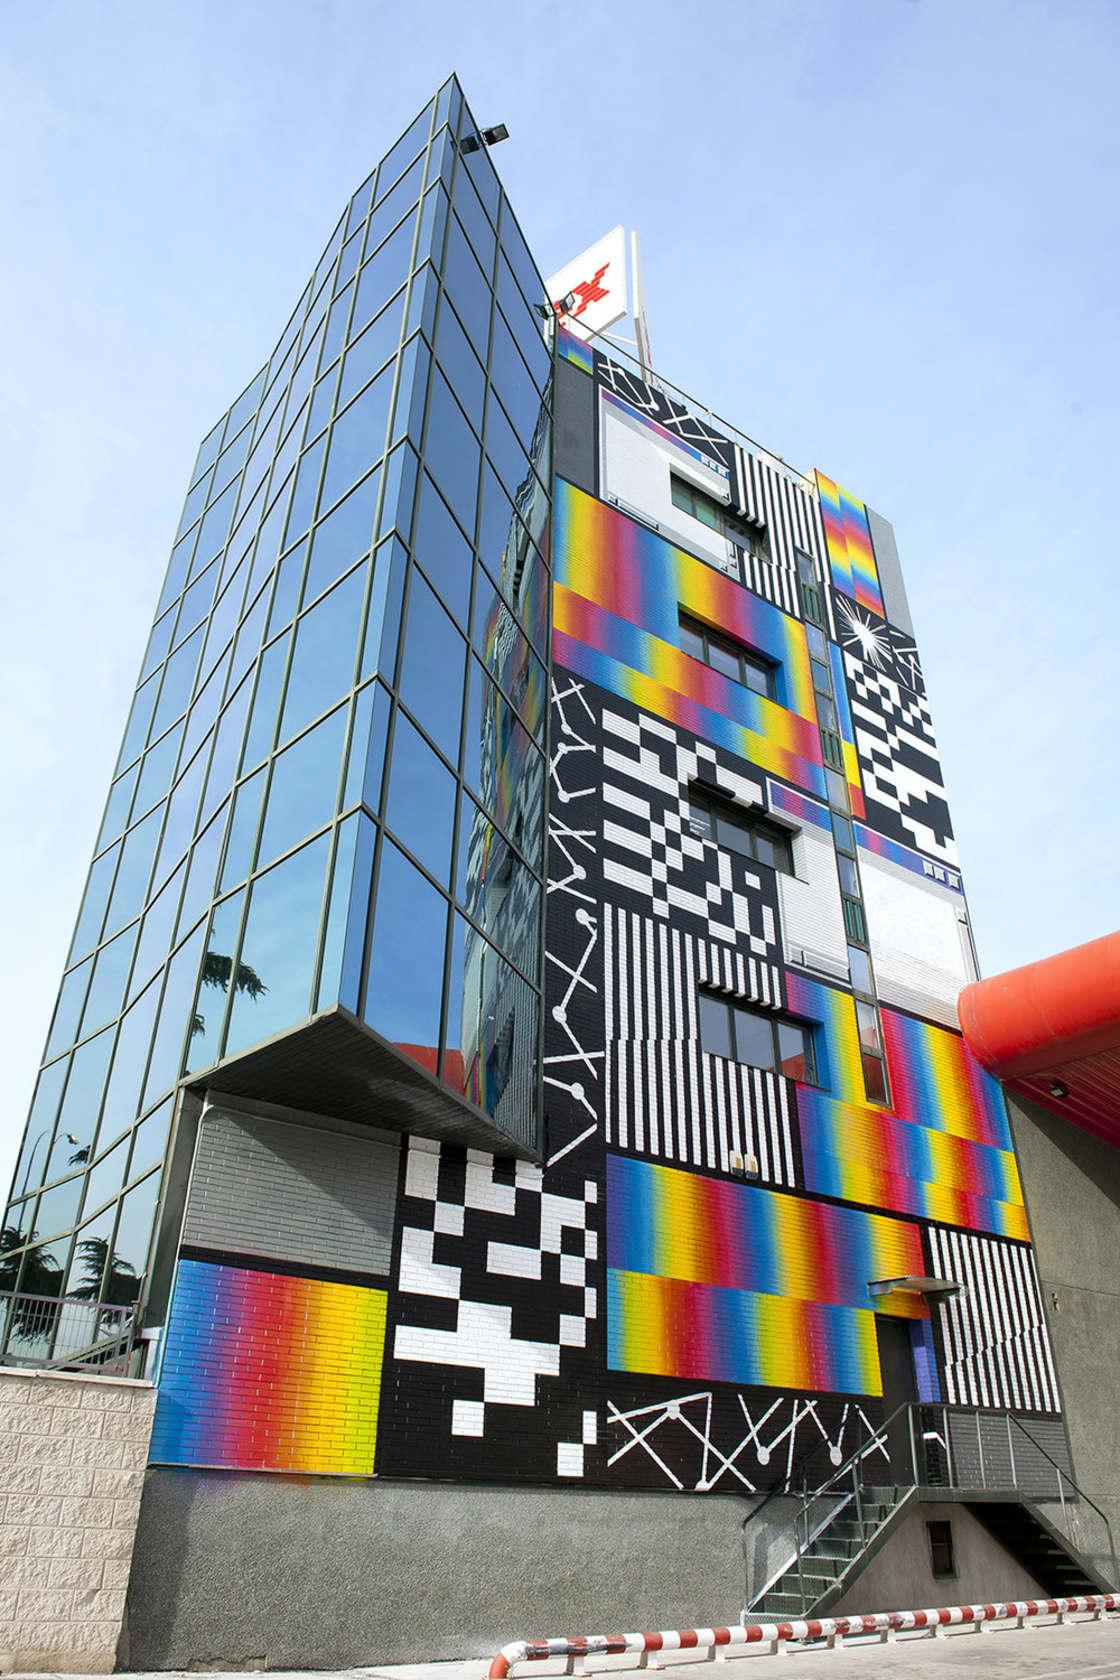 Glitch Art - The latest street art creations by Felipe Pantone